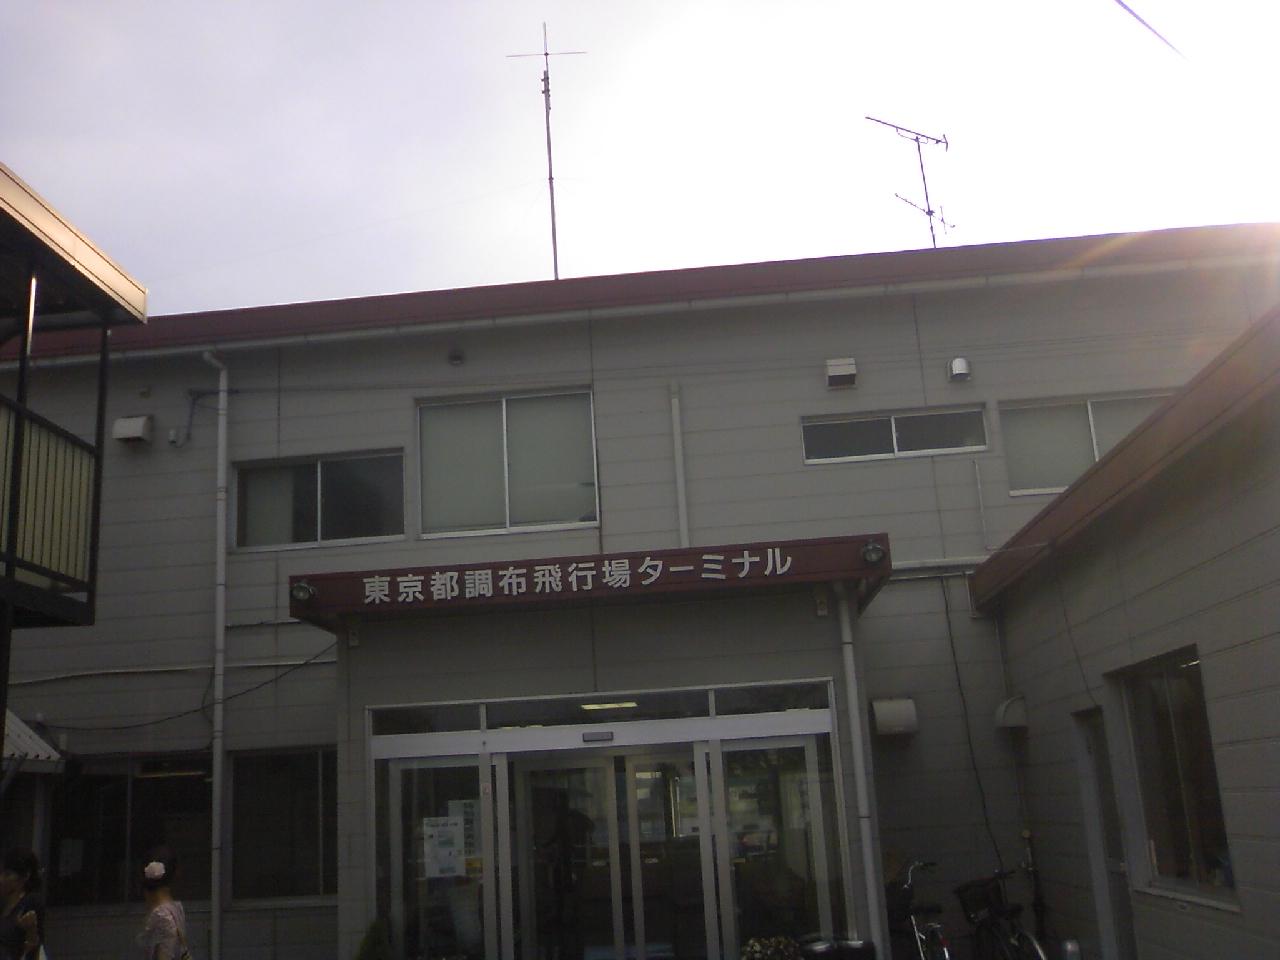 Ts3j0090